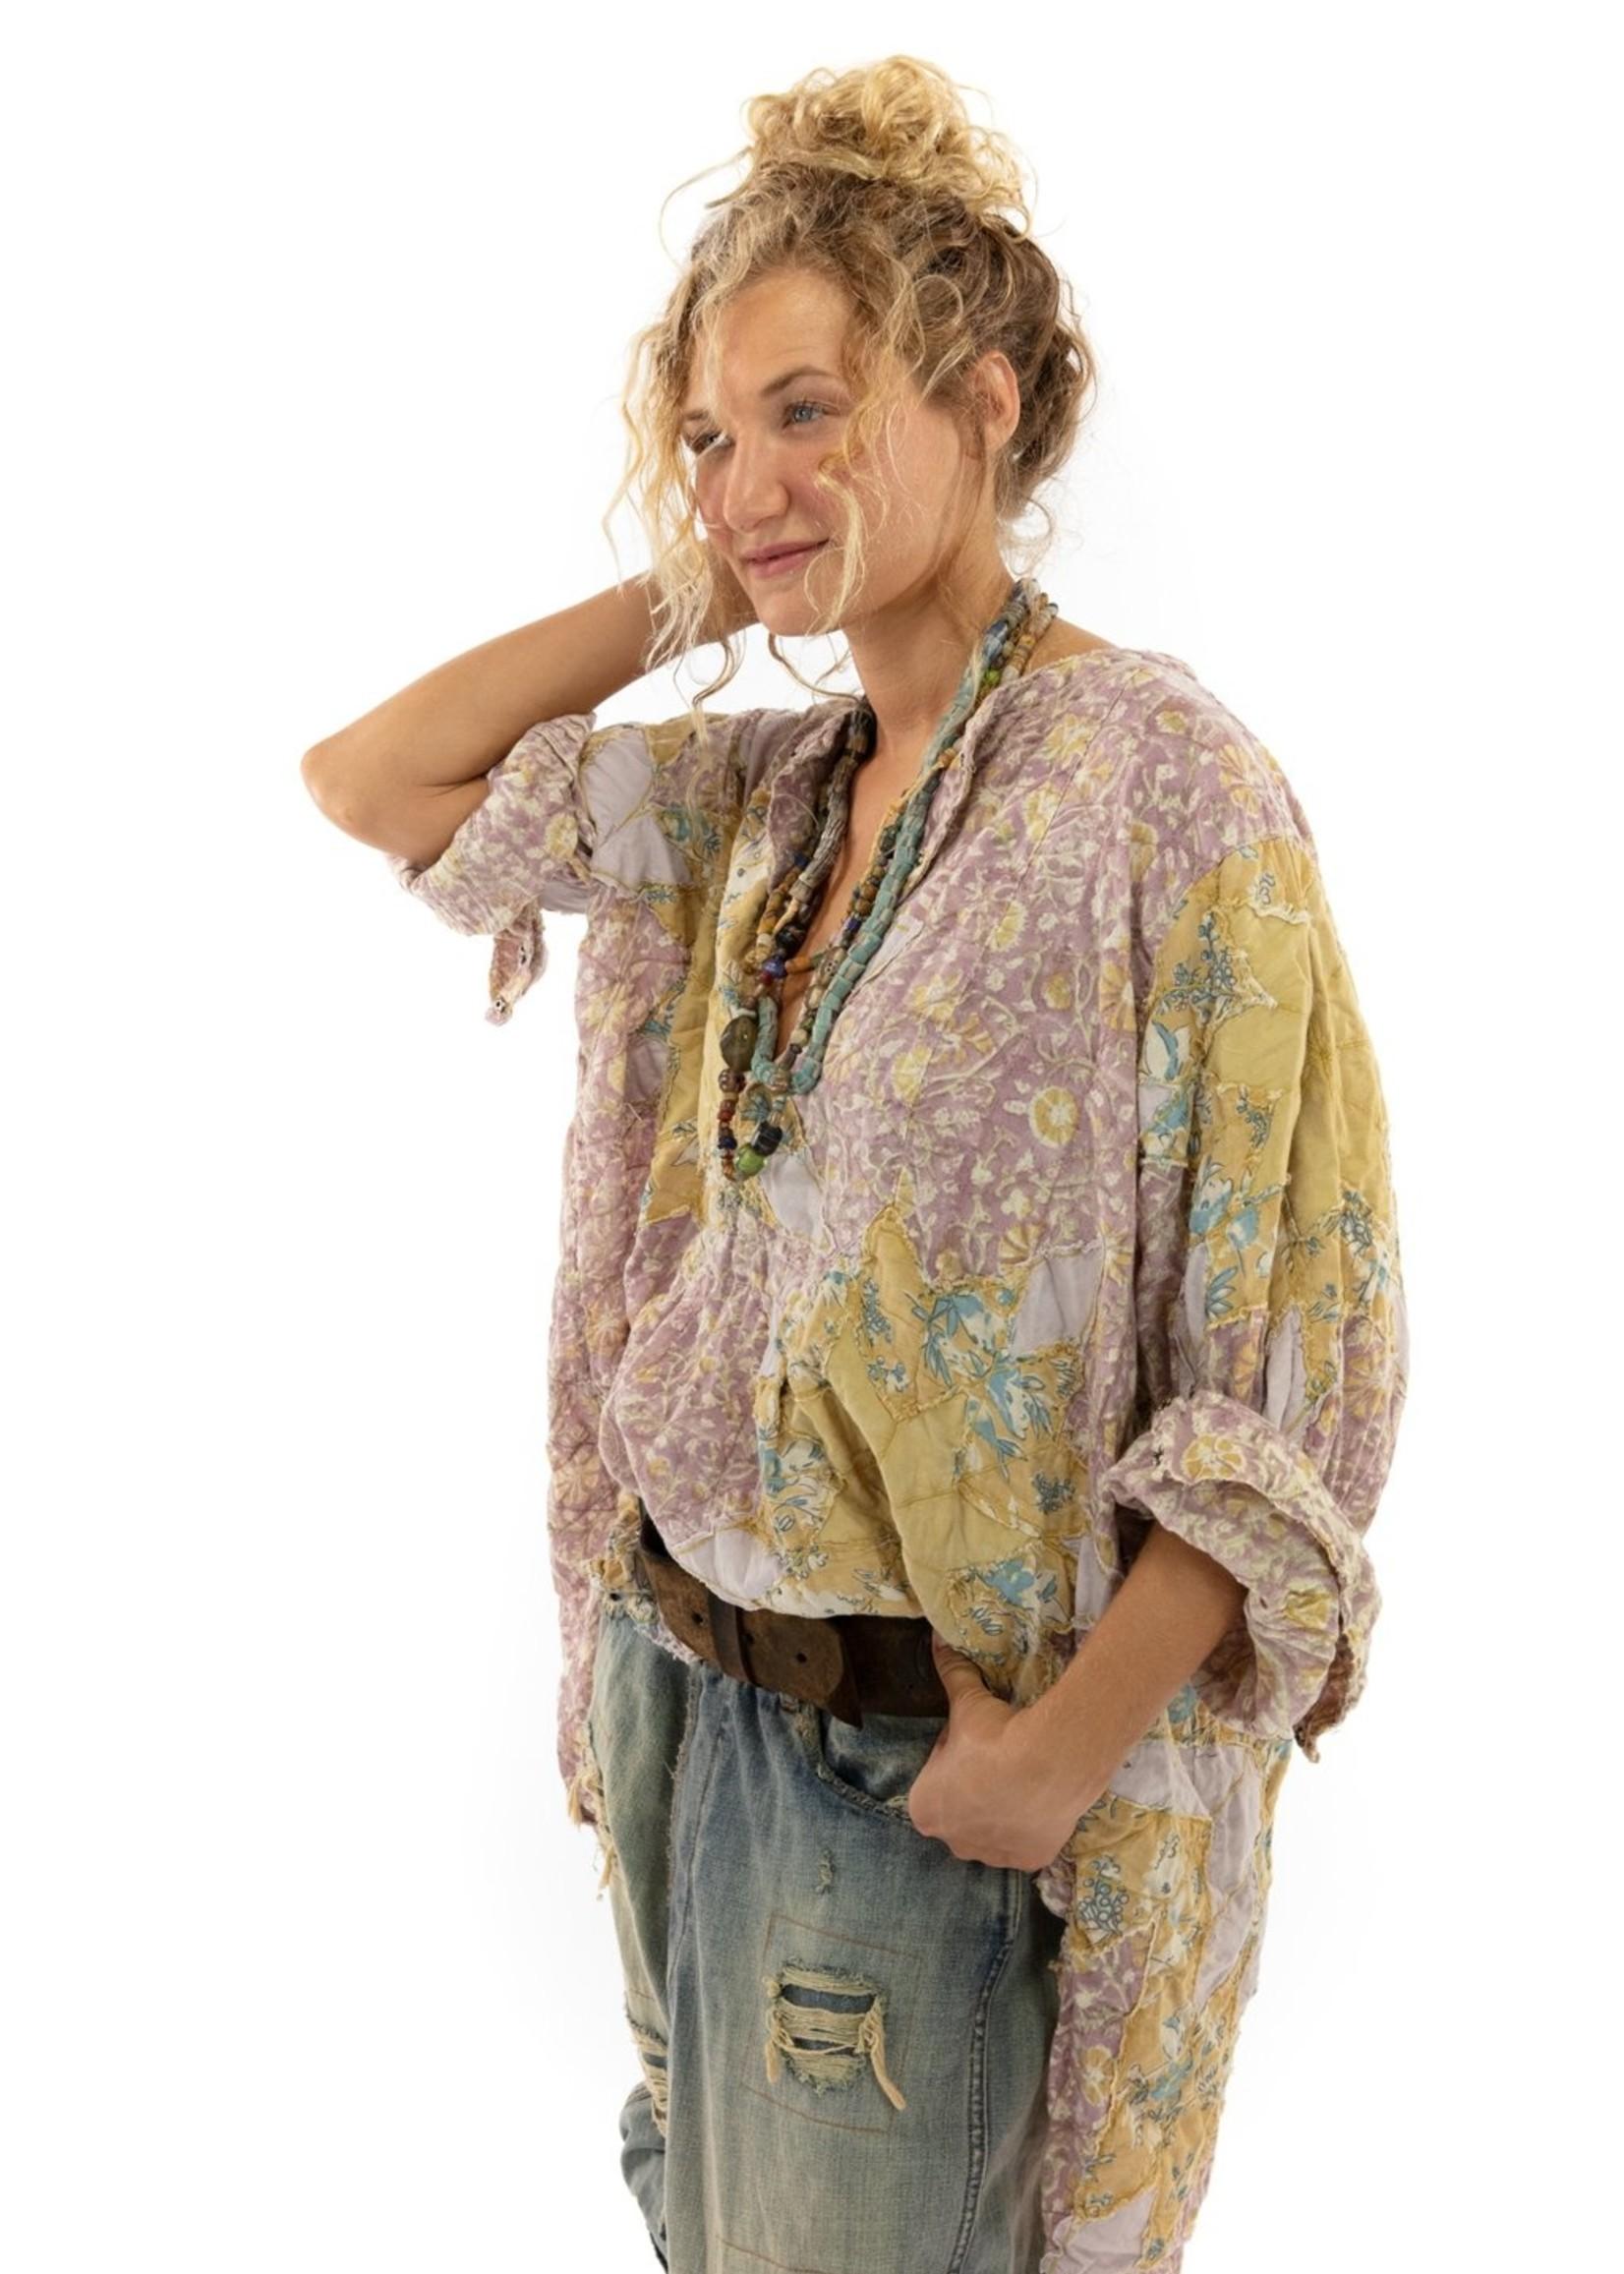 Magnolia Pearl Quiltwork Sunni Top - Impression